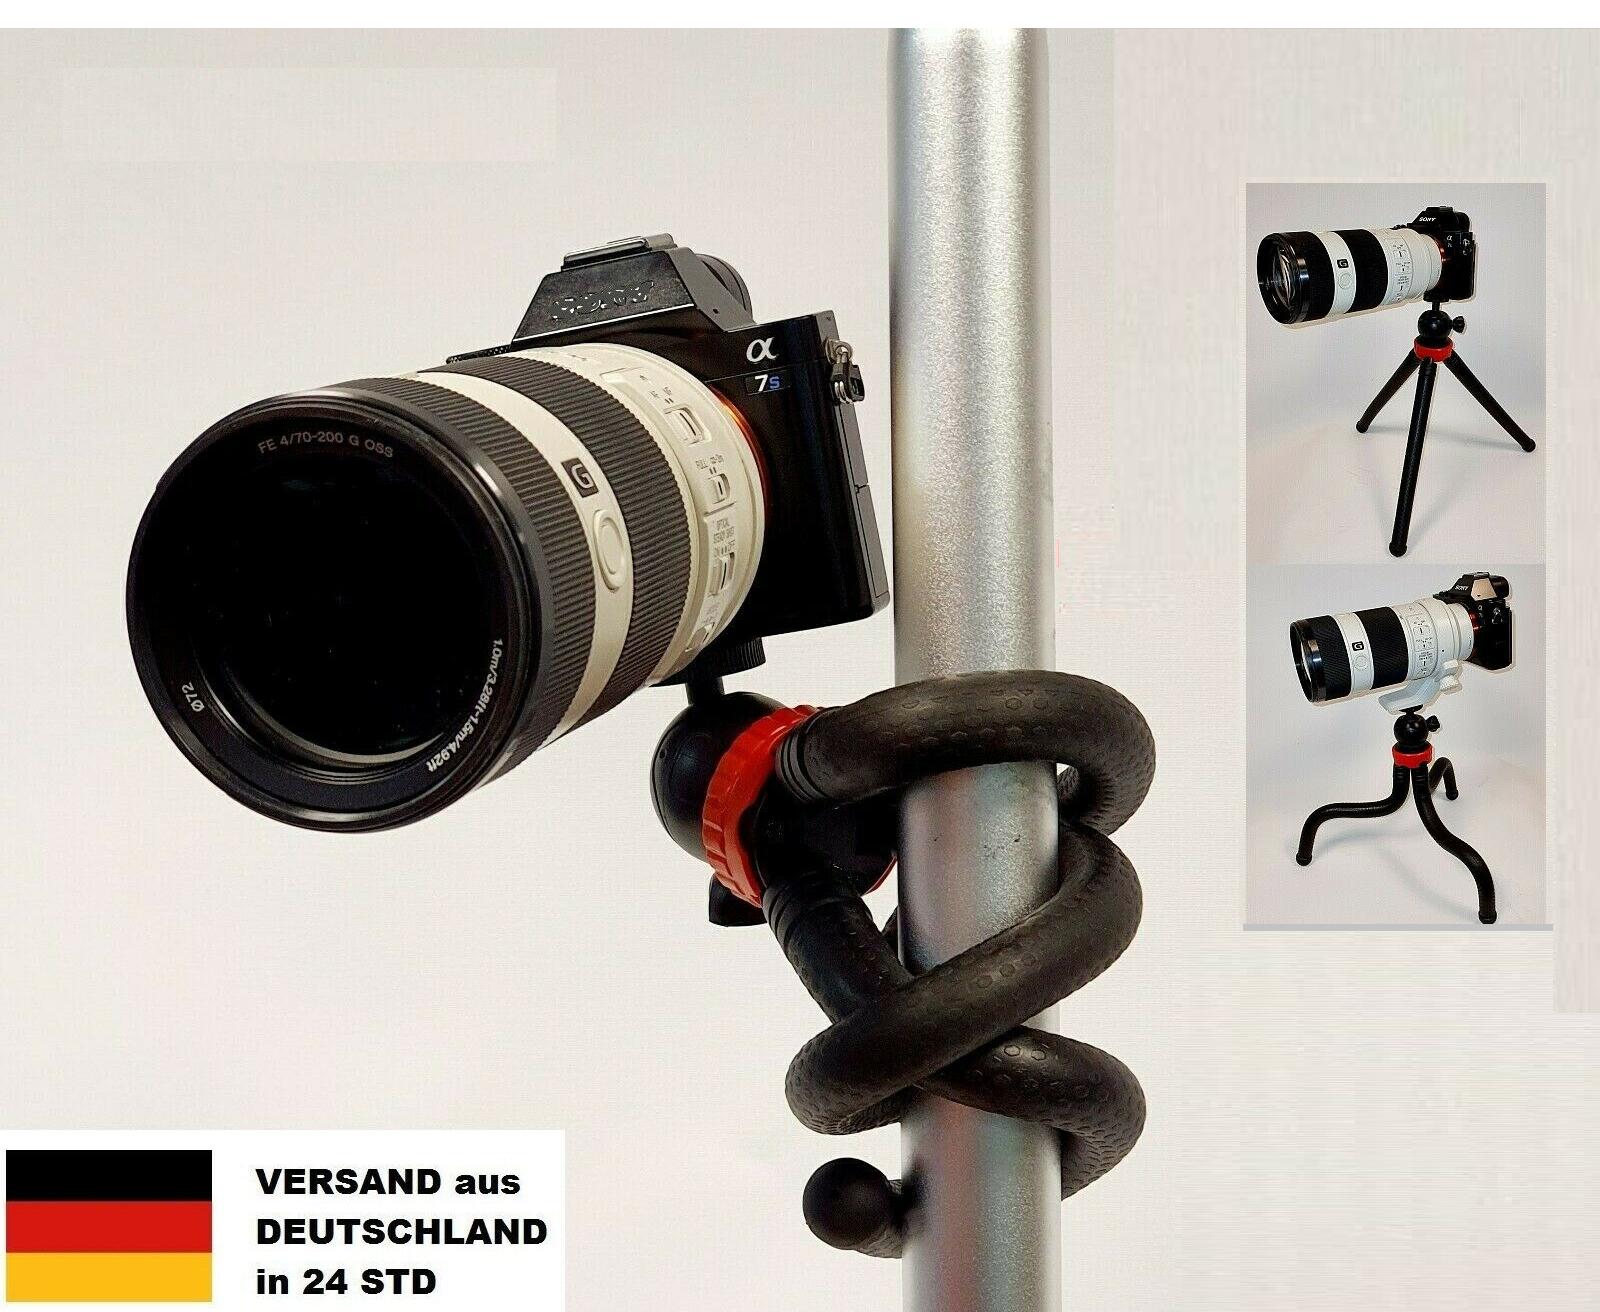 32cm Flexibles Stativ Reise Kamera Spiegelreflexkamera DSLR SLR Oktopus Gorilla